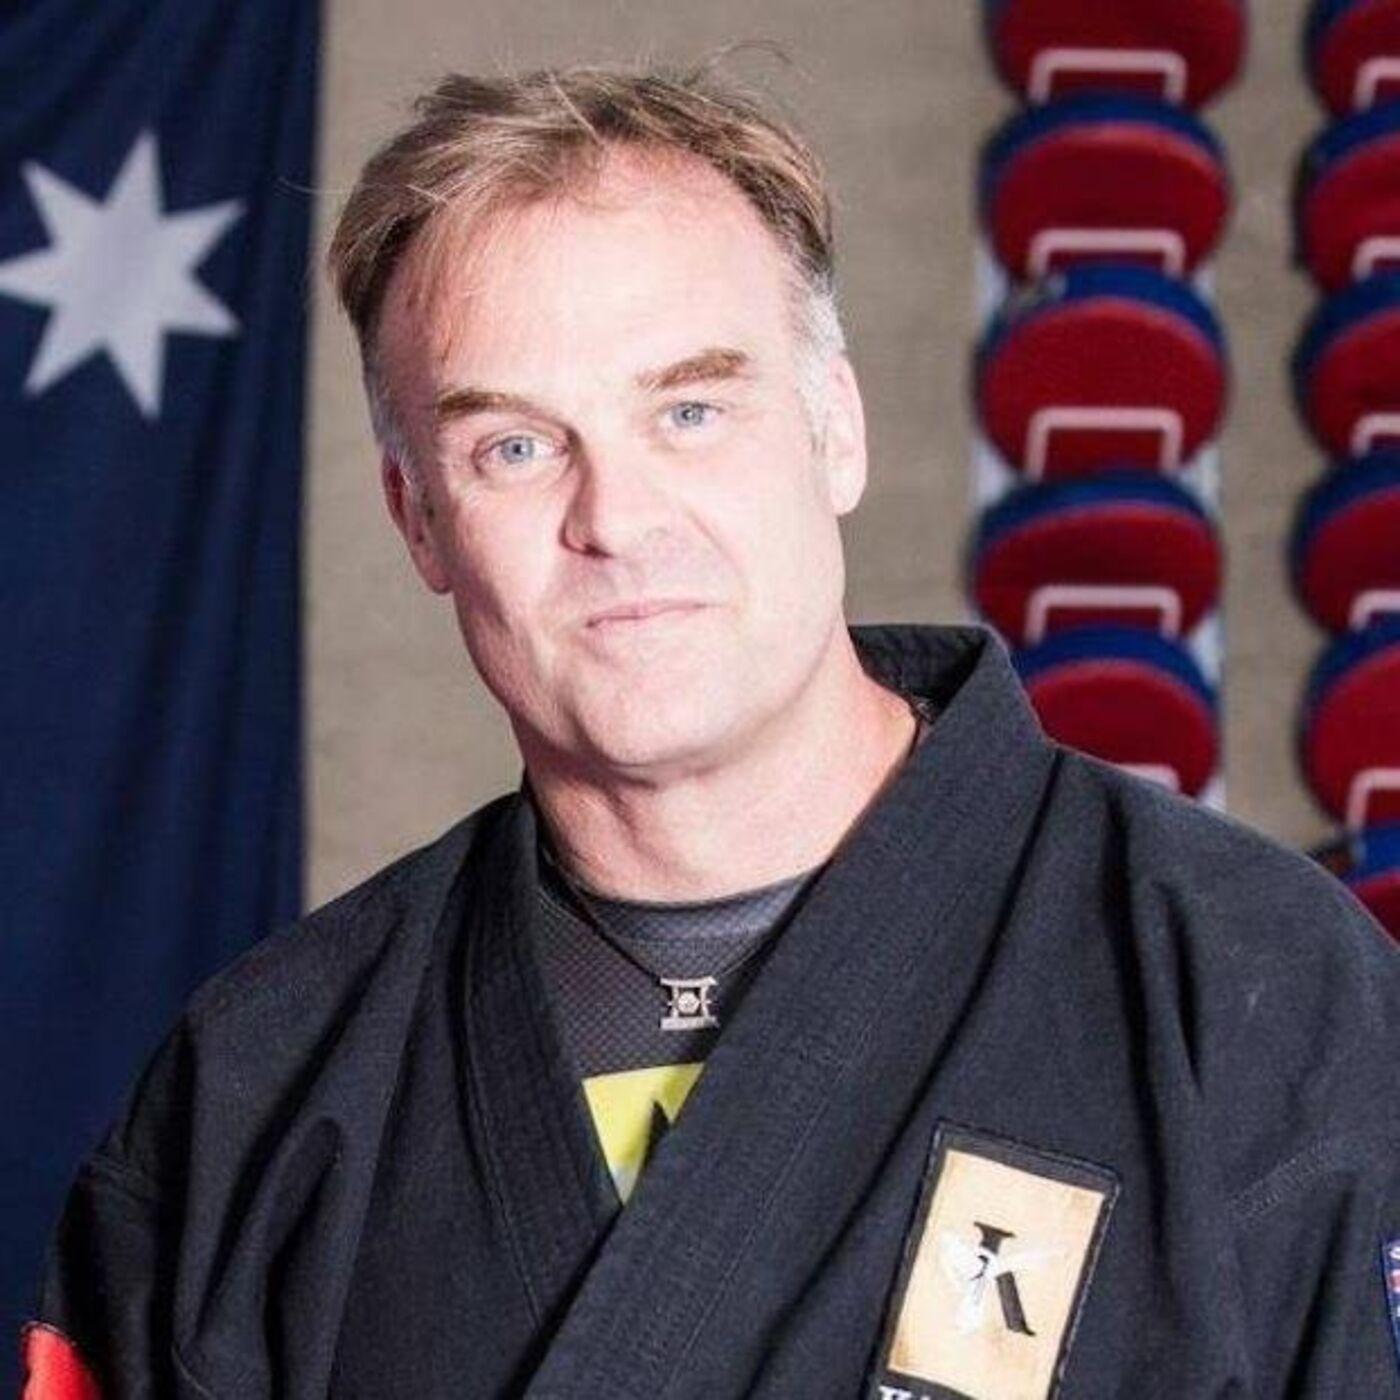 Paul Veldman - Martial Arts/Use of Force Legislation